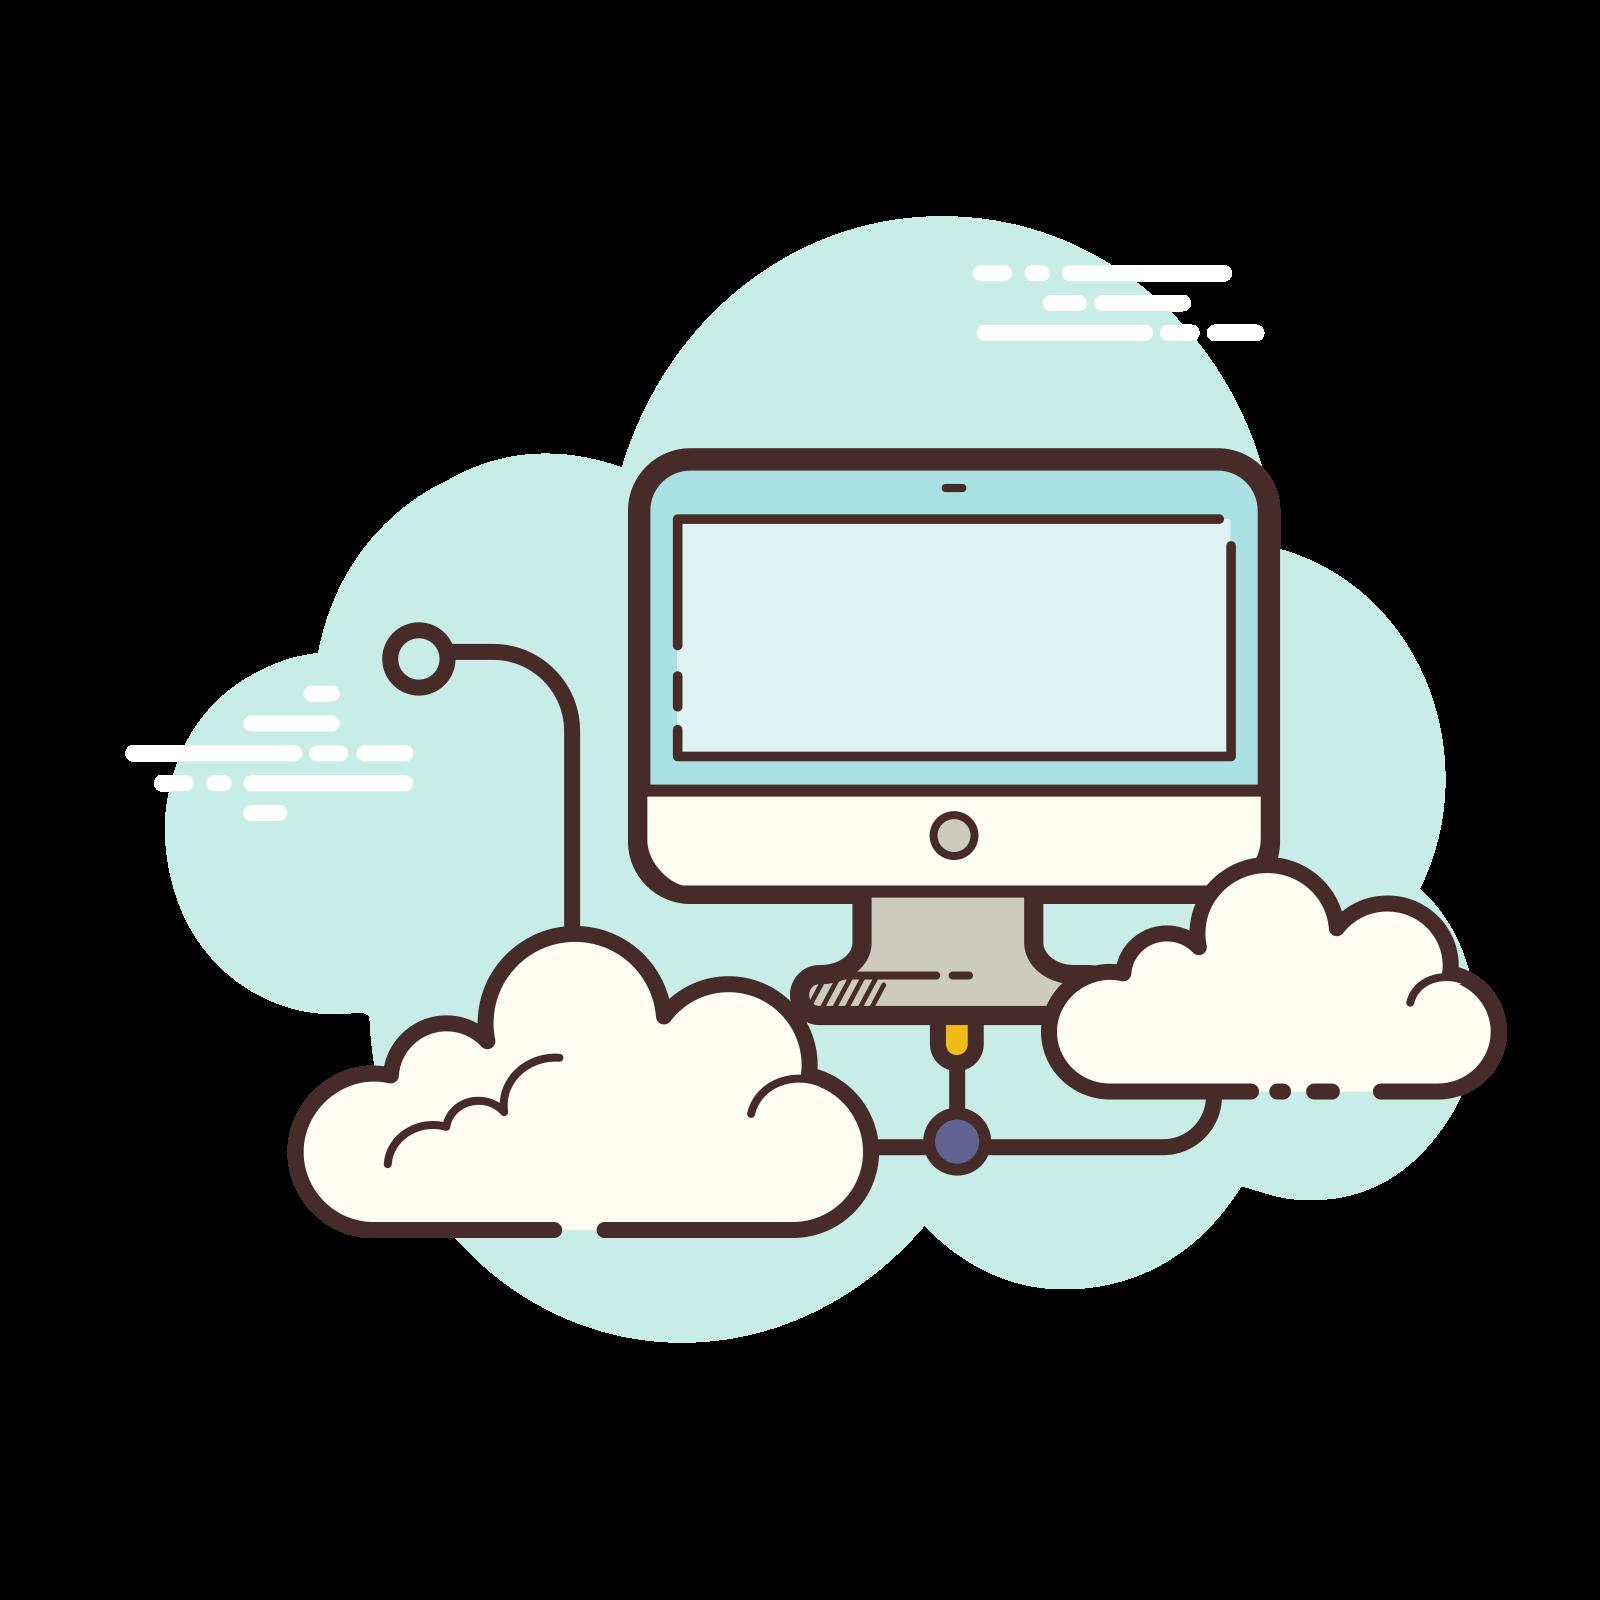 Web Imac icon